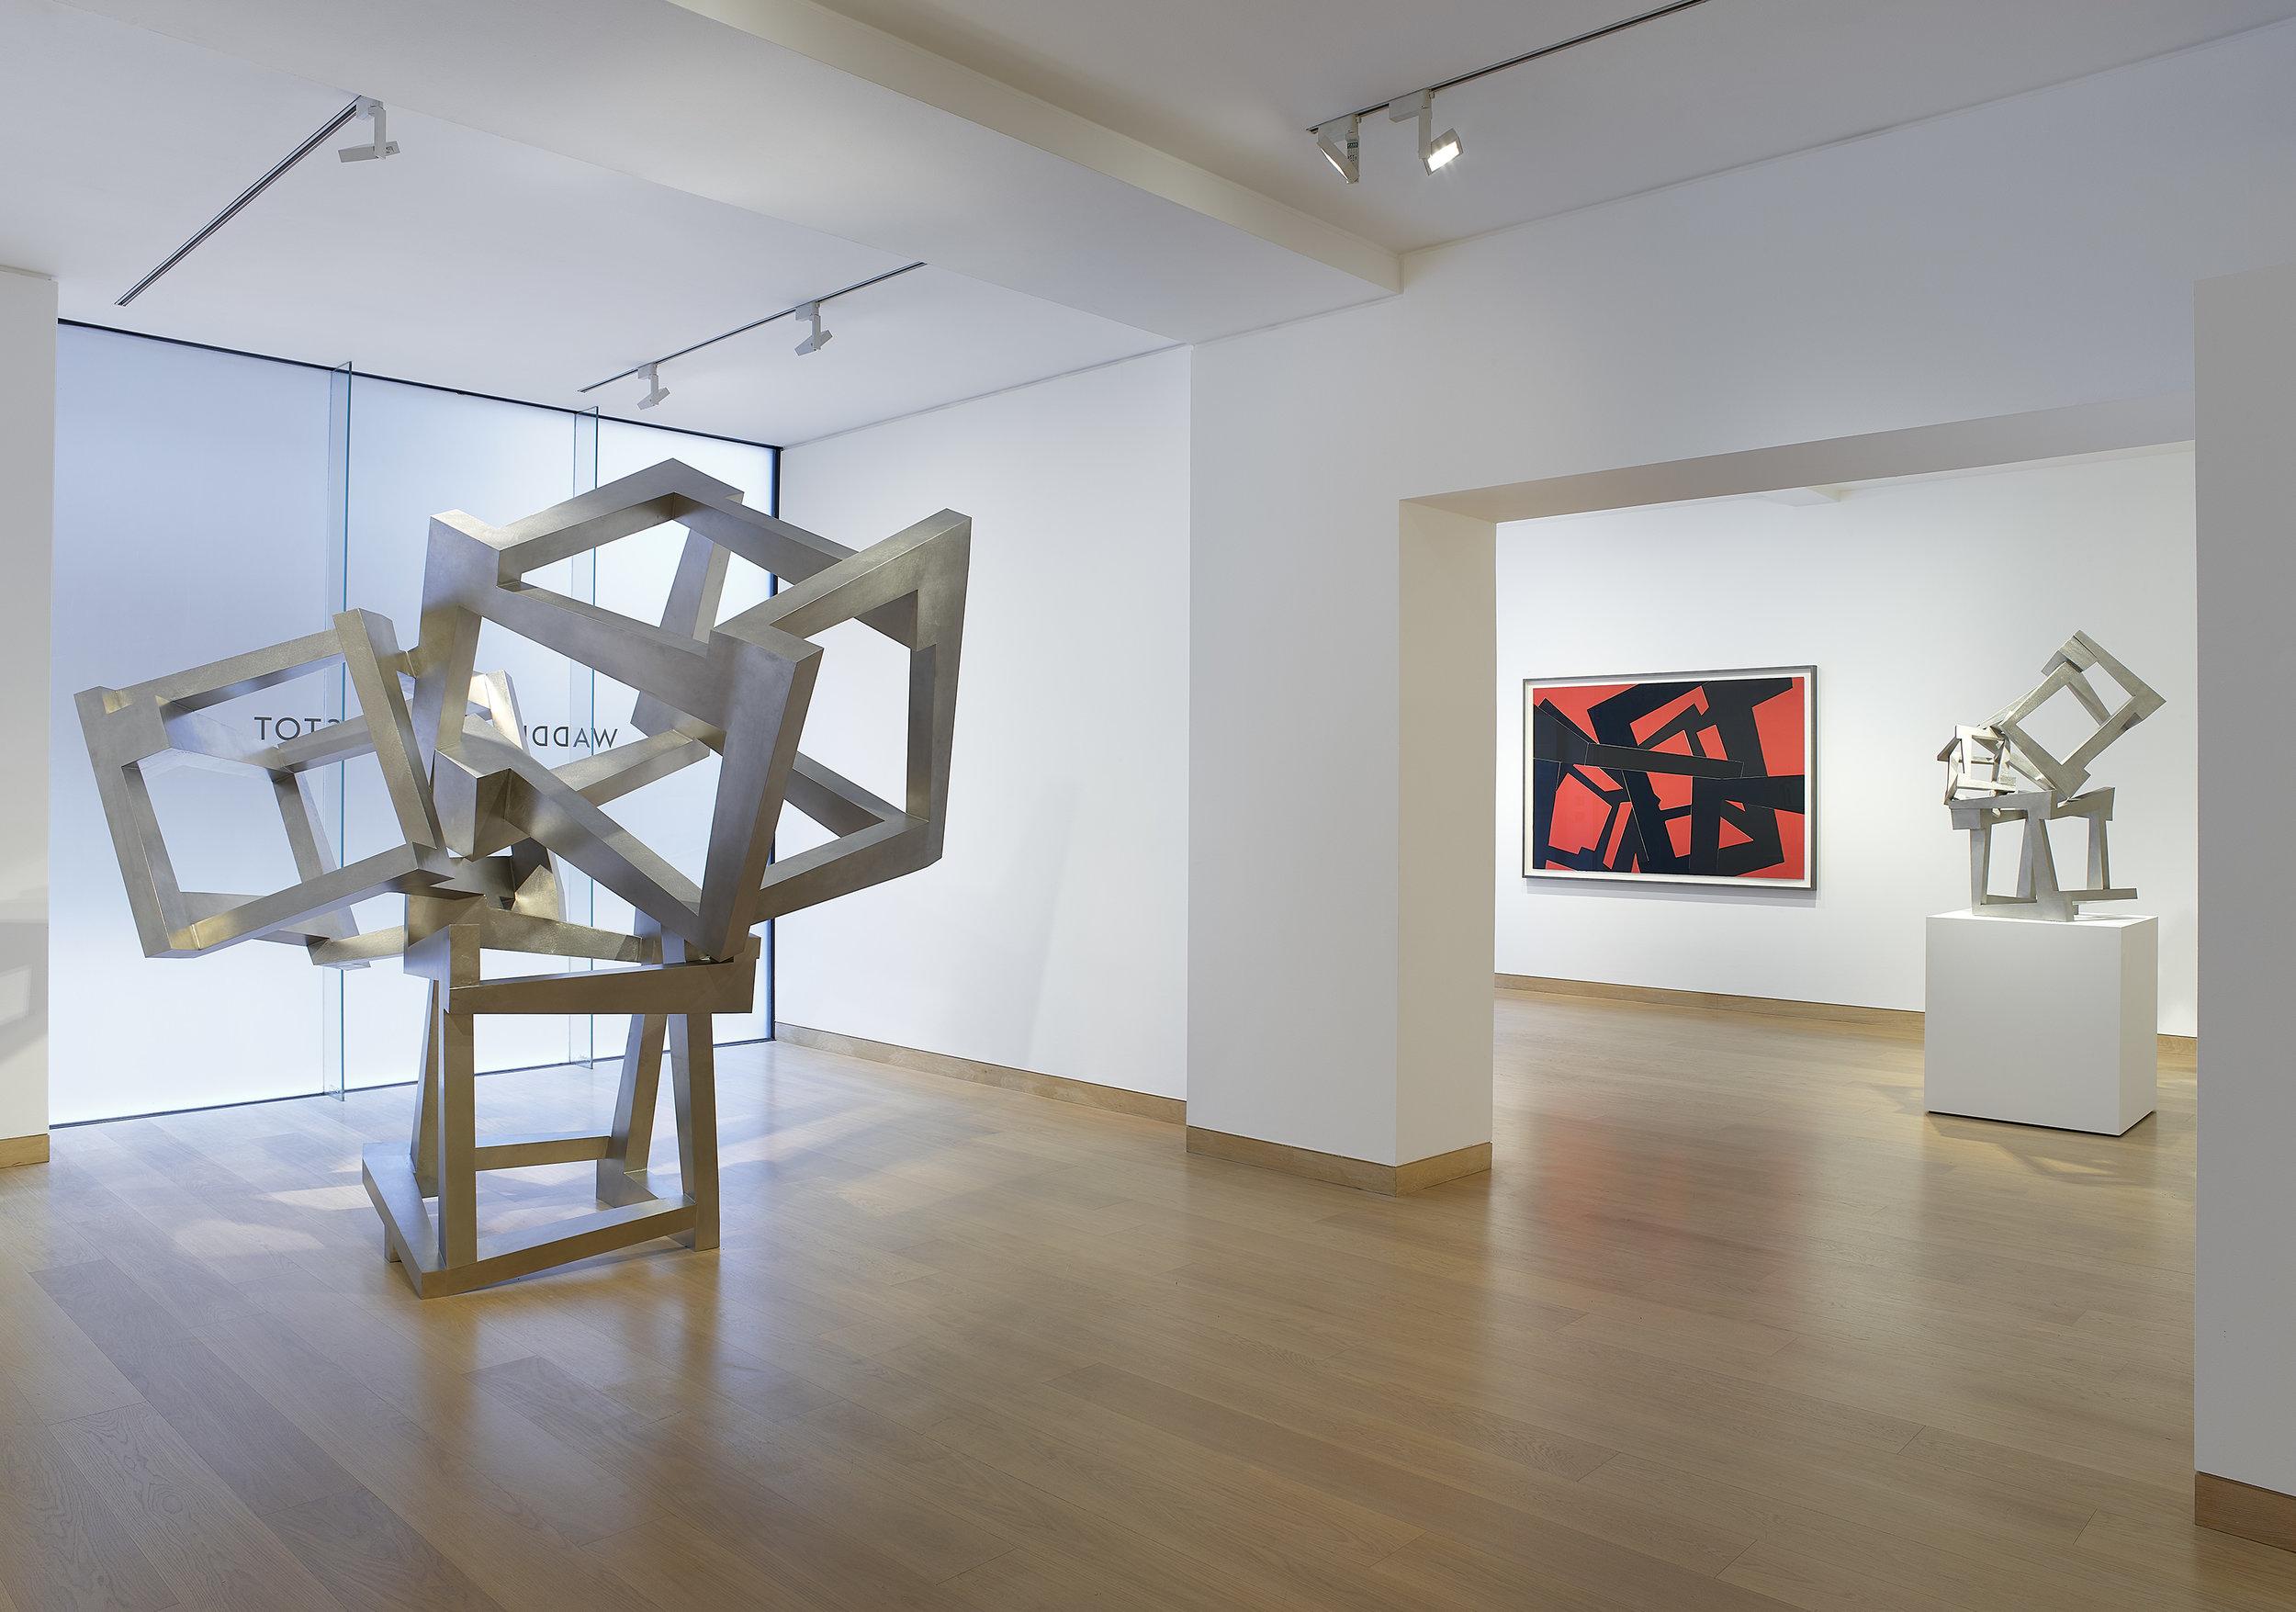 Exhibition installation , JeddNovatt: Conversations with Gravity , Waddington Custot, London, 2018 © JeddNovatt, 2019. Courtesy Waddington Custot.